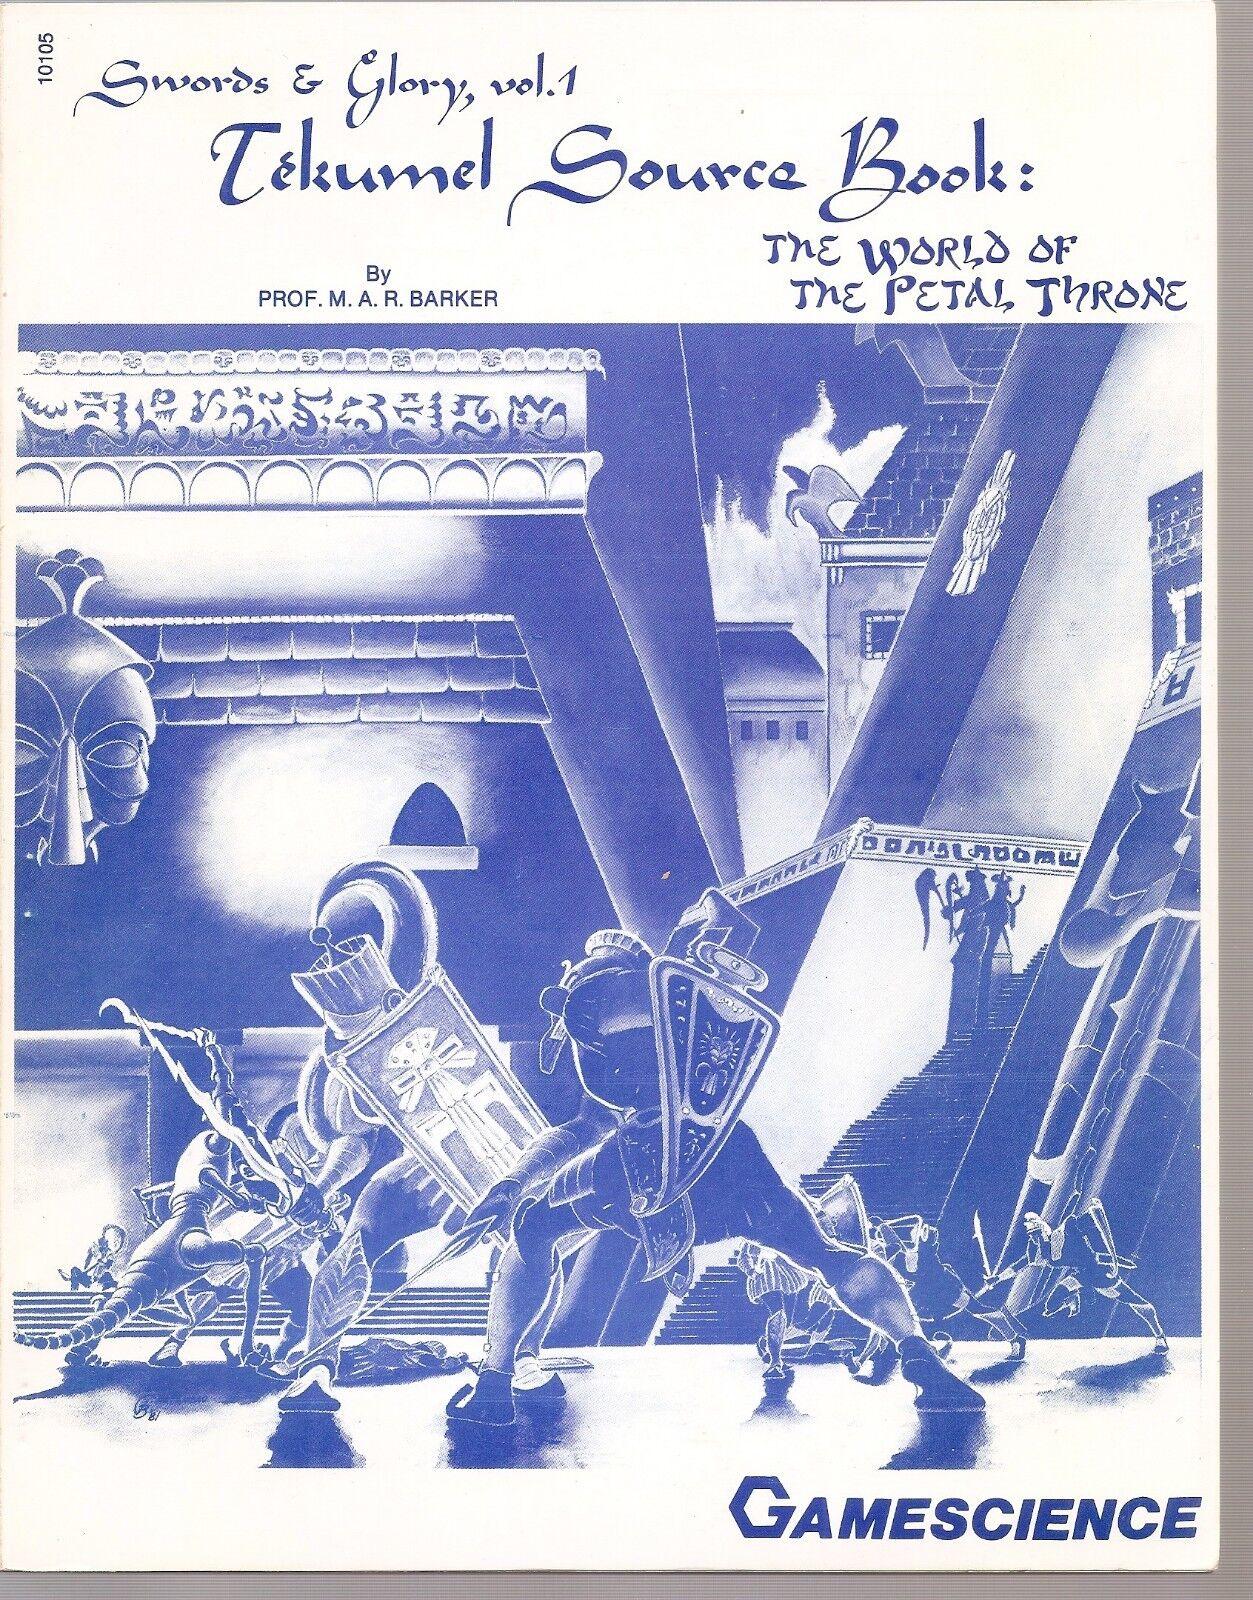 Swords & Glory, Vol 1.tekumel source book   the world of the petal throne, games